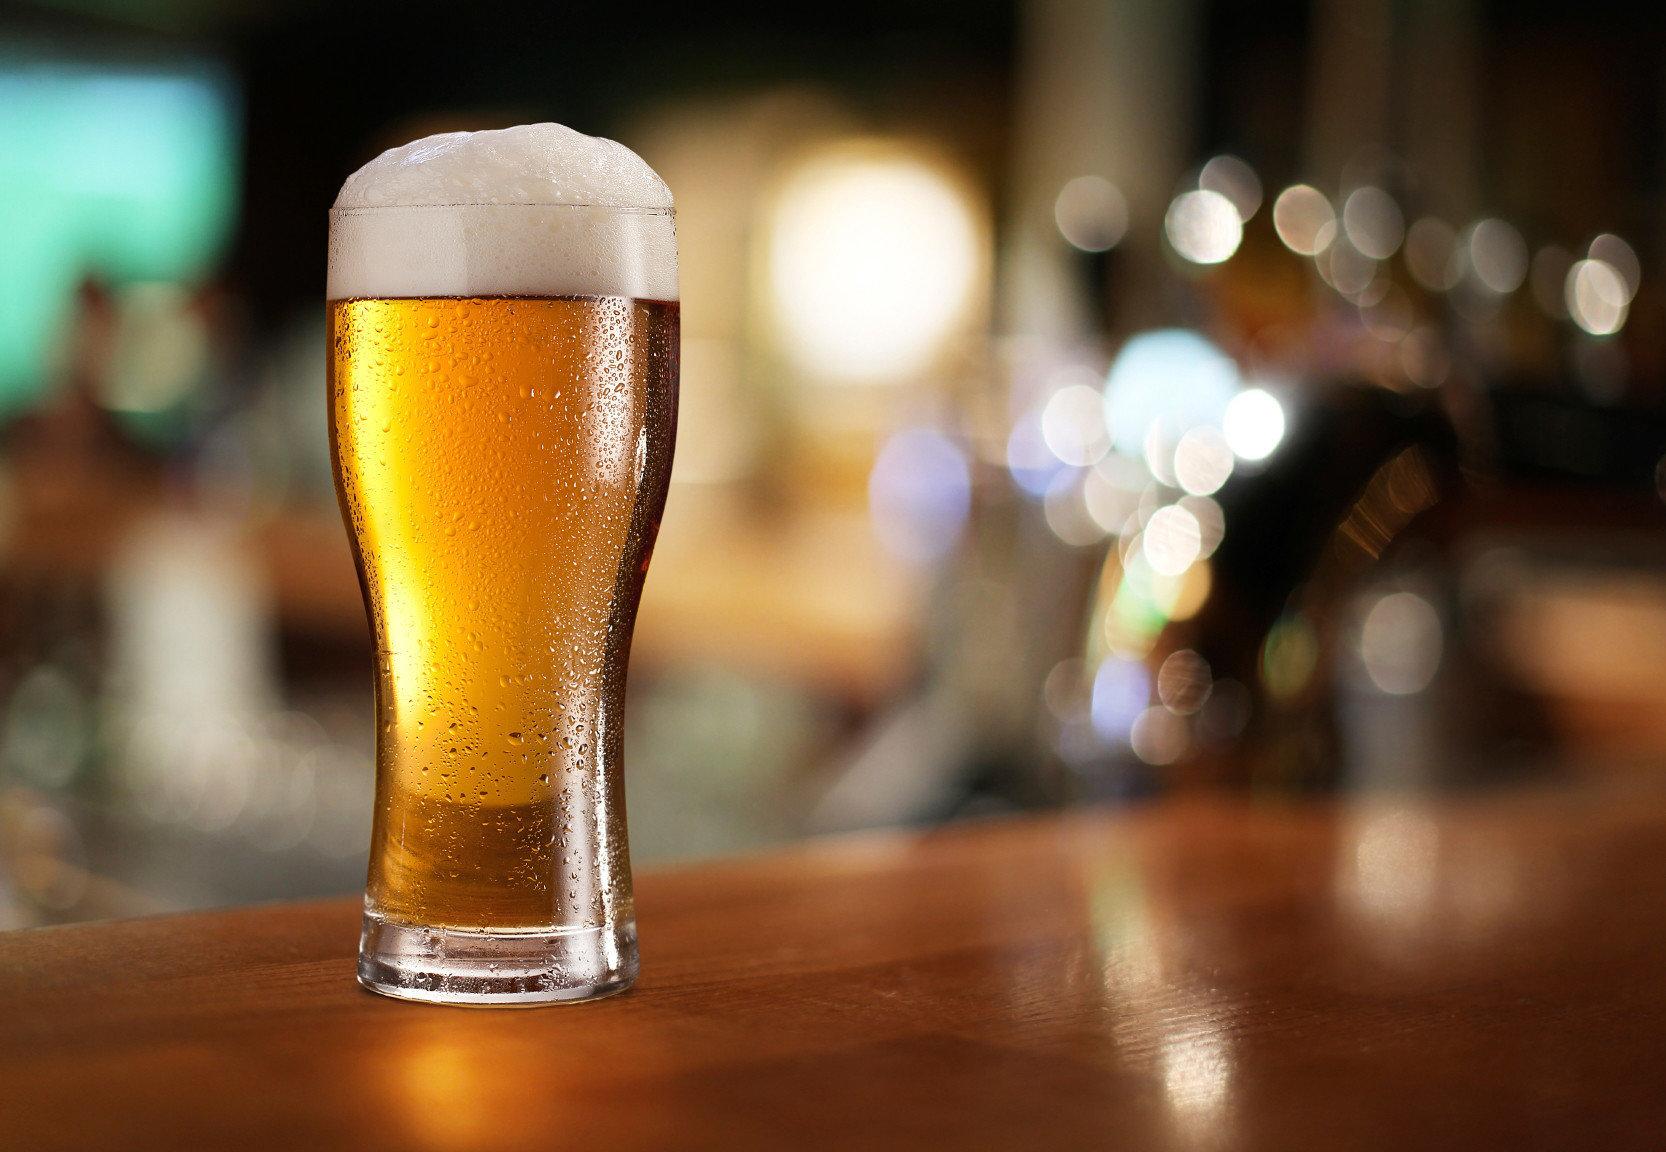 cup Drink beer alcoholic beverage glass alcohol night wooden cocktail distilled beverage pint us beverage close